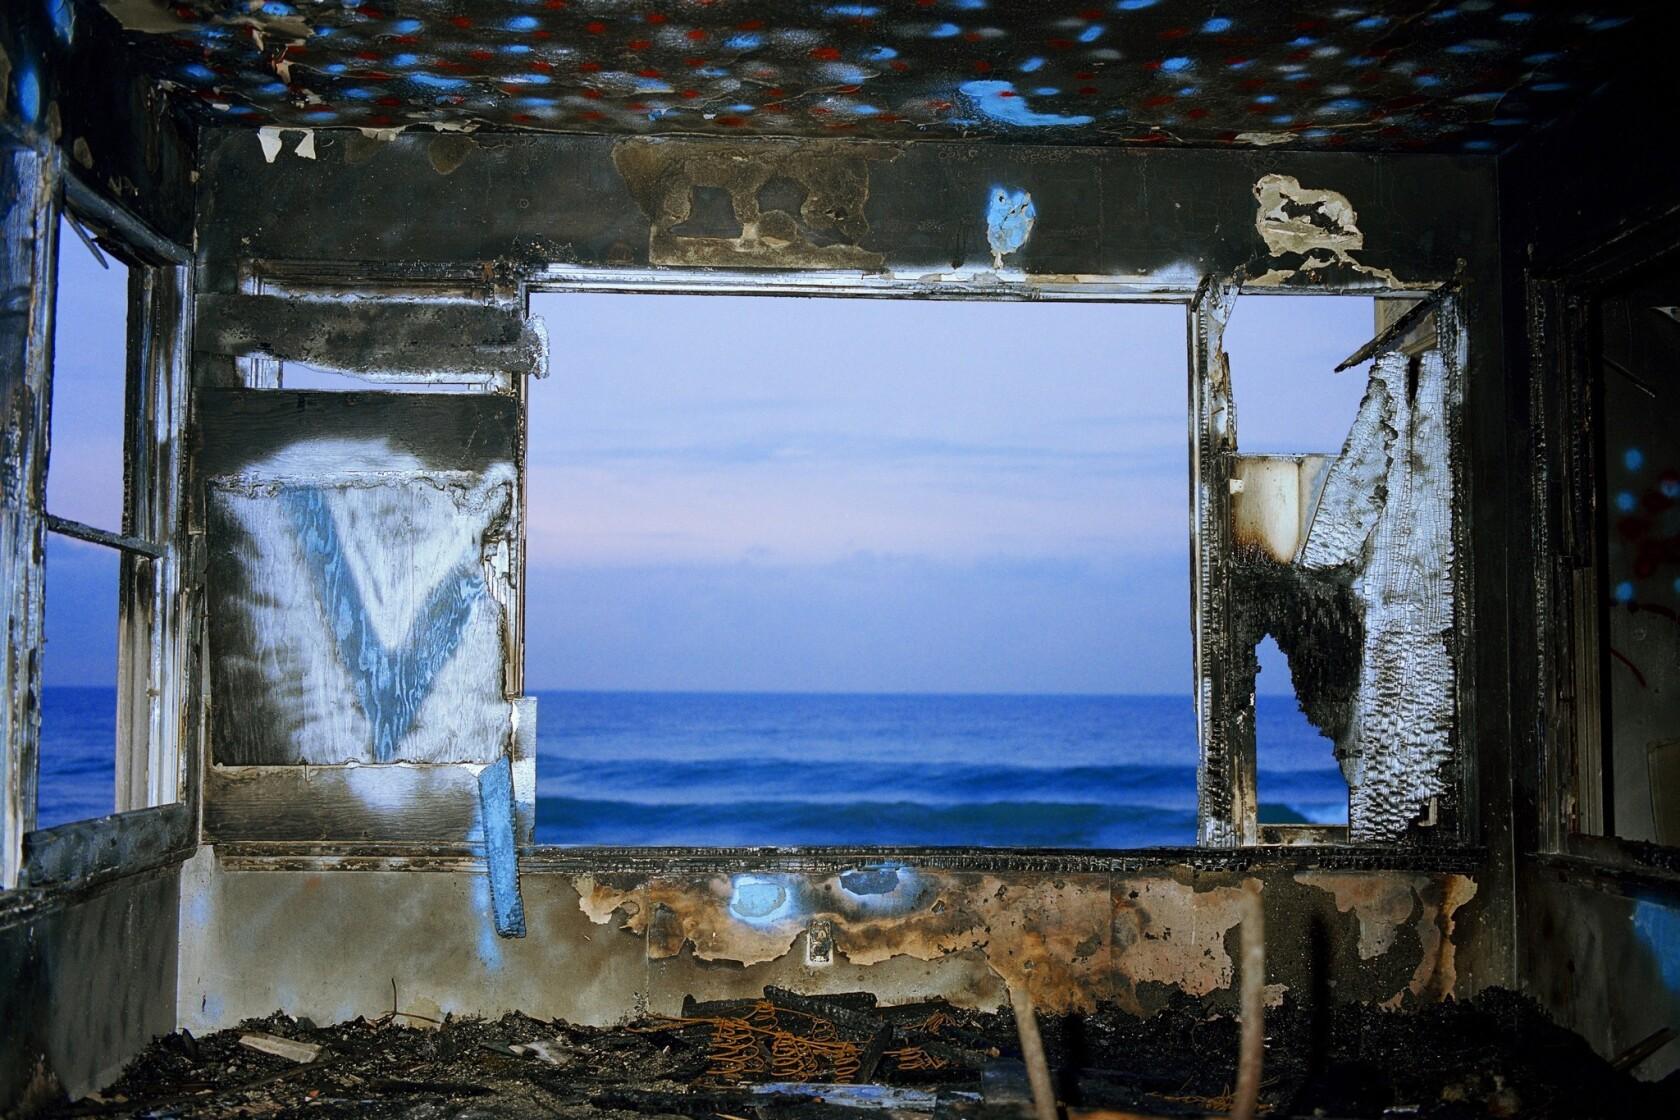 In John Divola's photographs, an elusive presence - Los Angeles Times